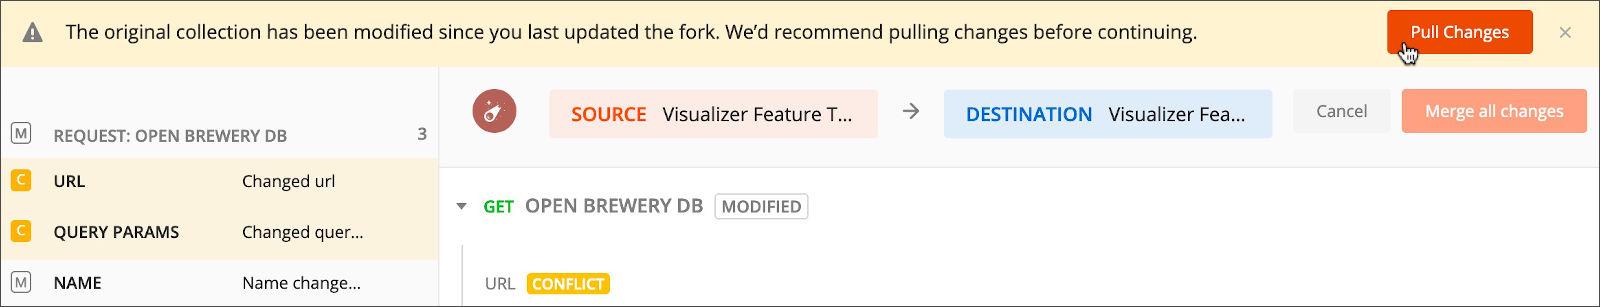 Update Fork